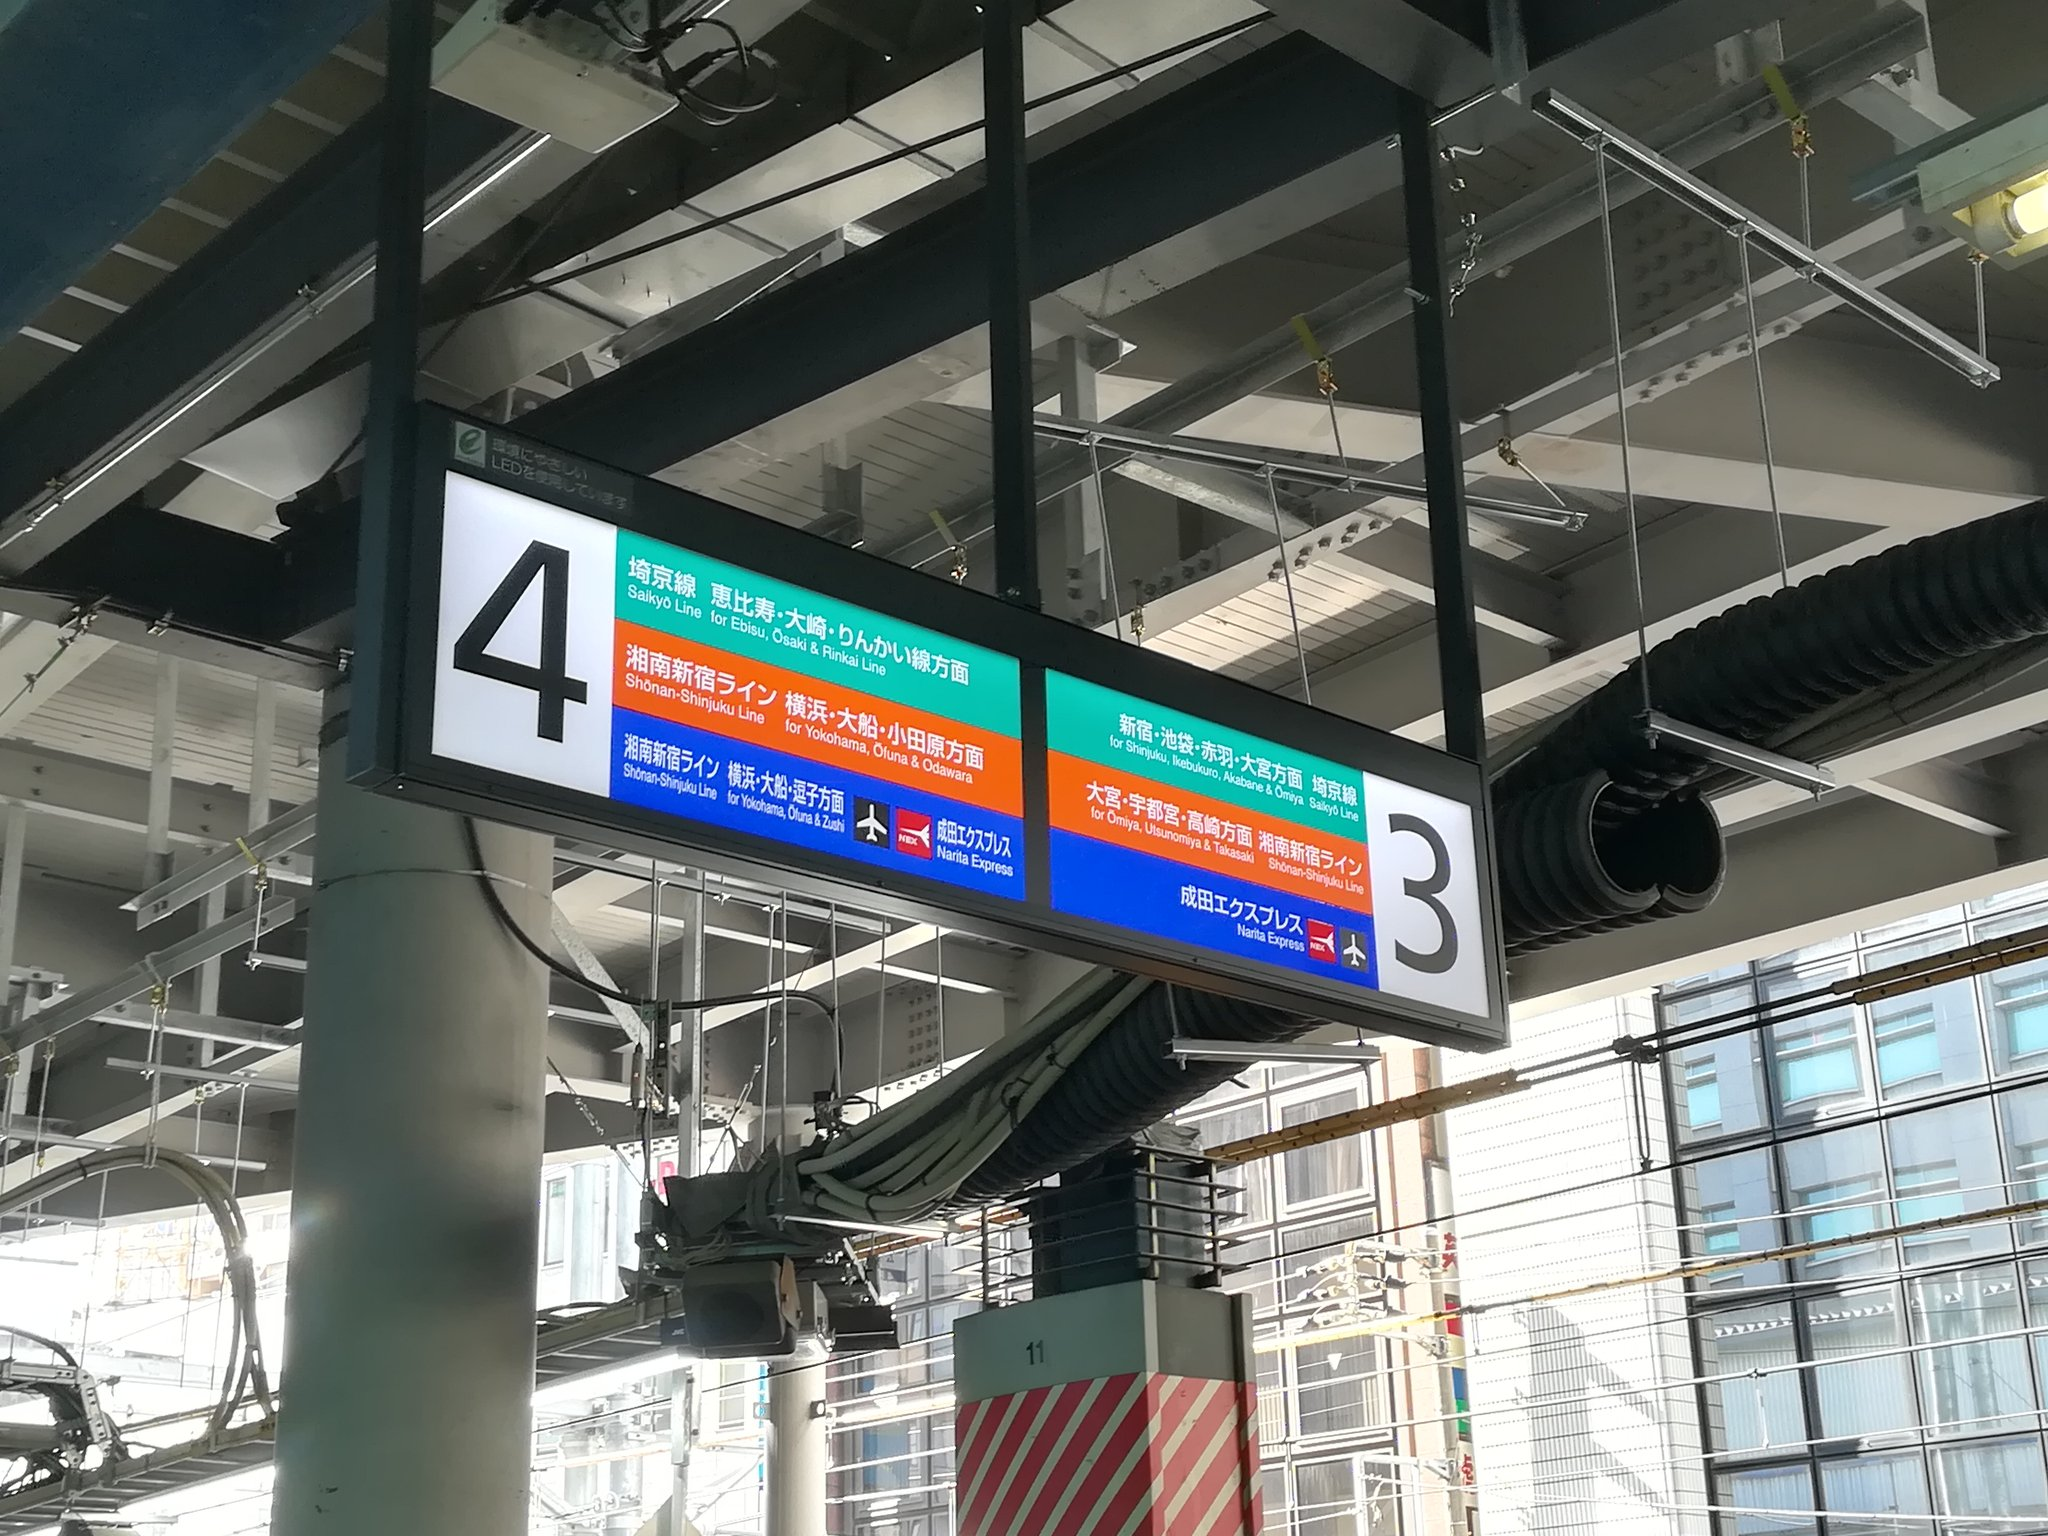 画像,埼京線新宿駅人身事故の影響で、埼京線、山手線運転見合せ。 https://t.co/kJfaGJsQav。